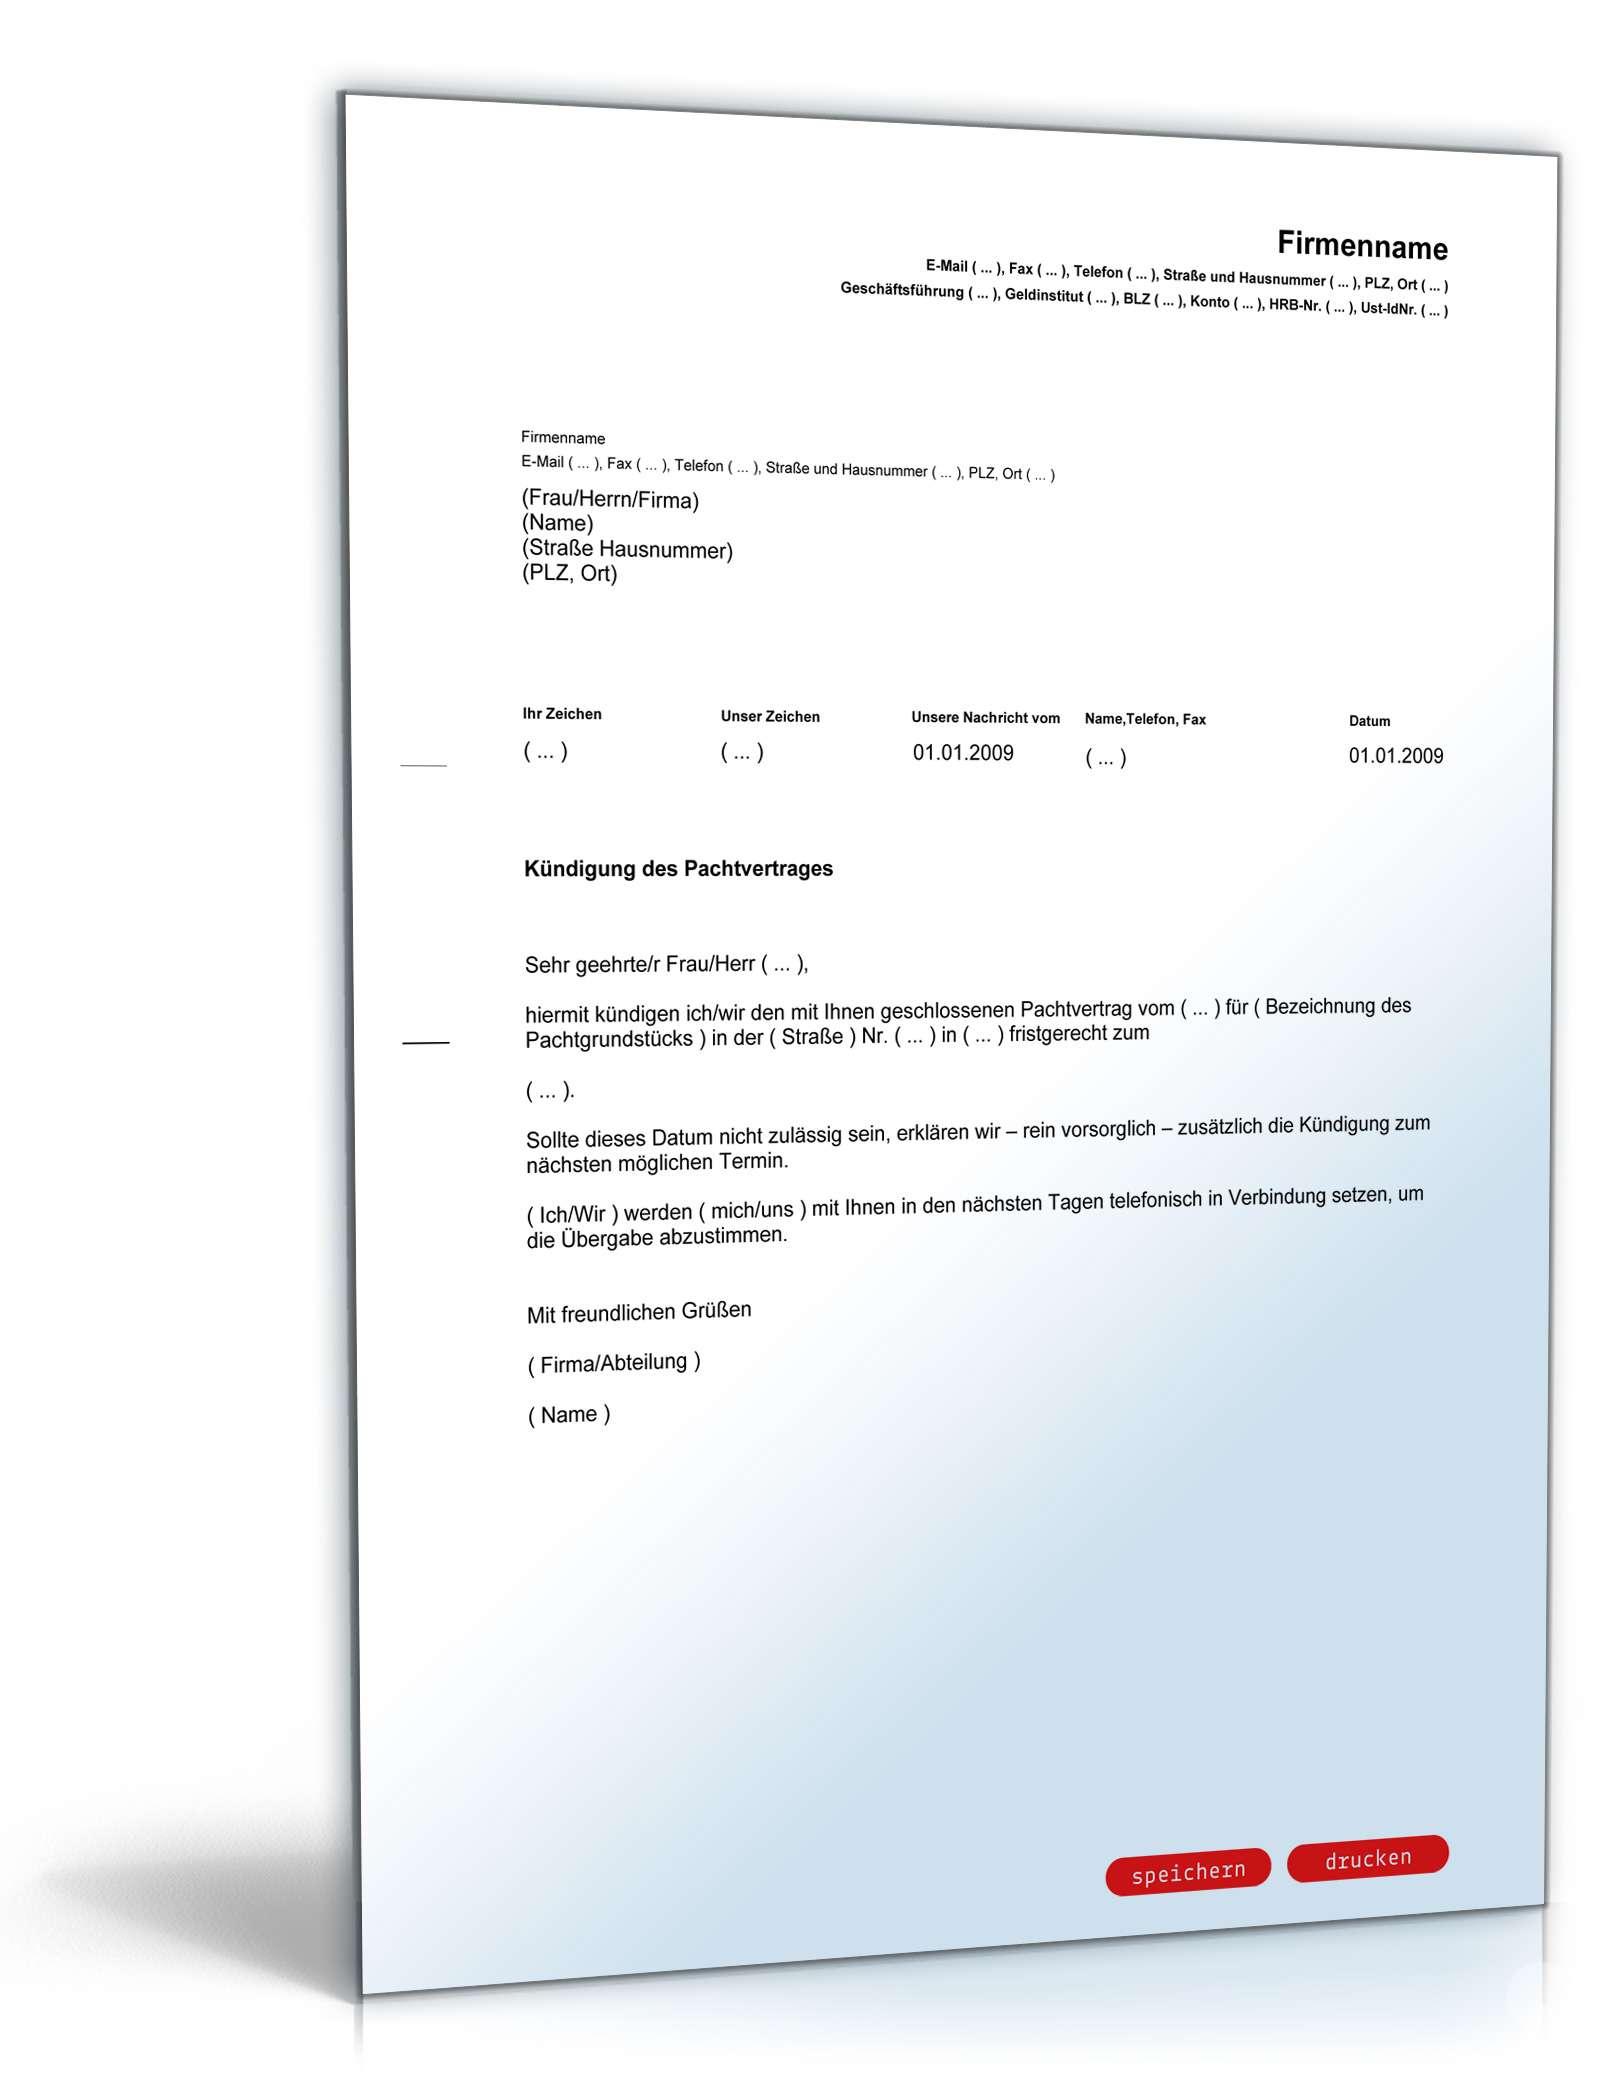 kndigung pachtvertrag - Arbeitskundigung Muster